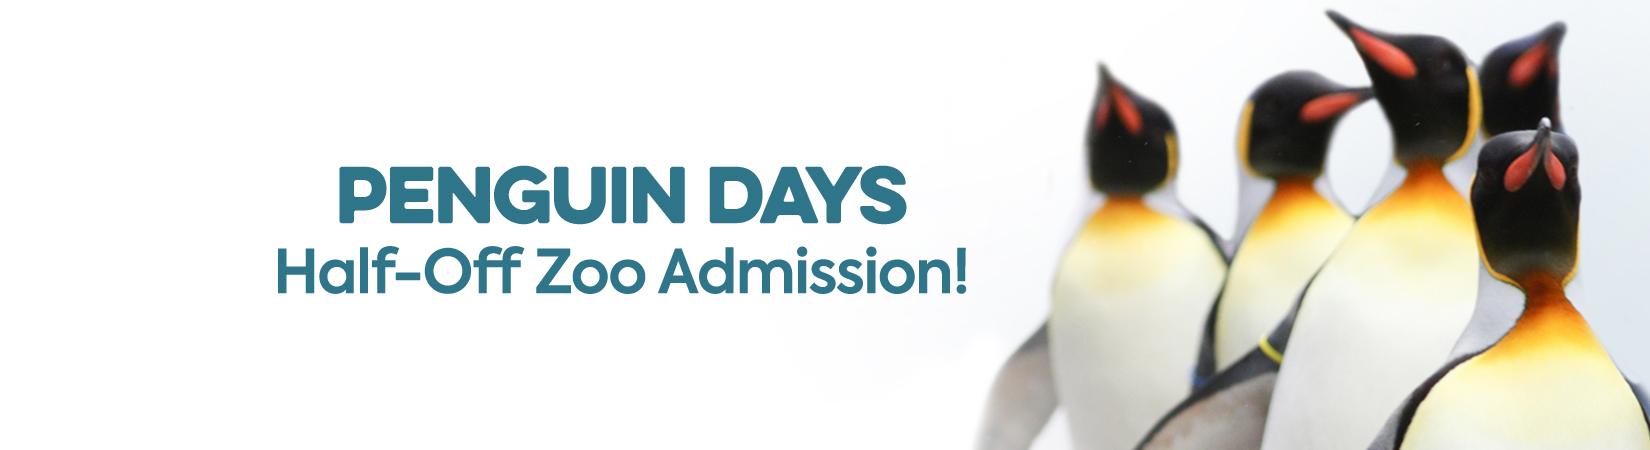 Welcome to the Cincinnati Zoo - Cincinnati Zoo & Botanical Garden®